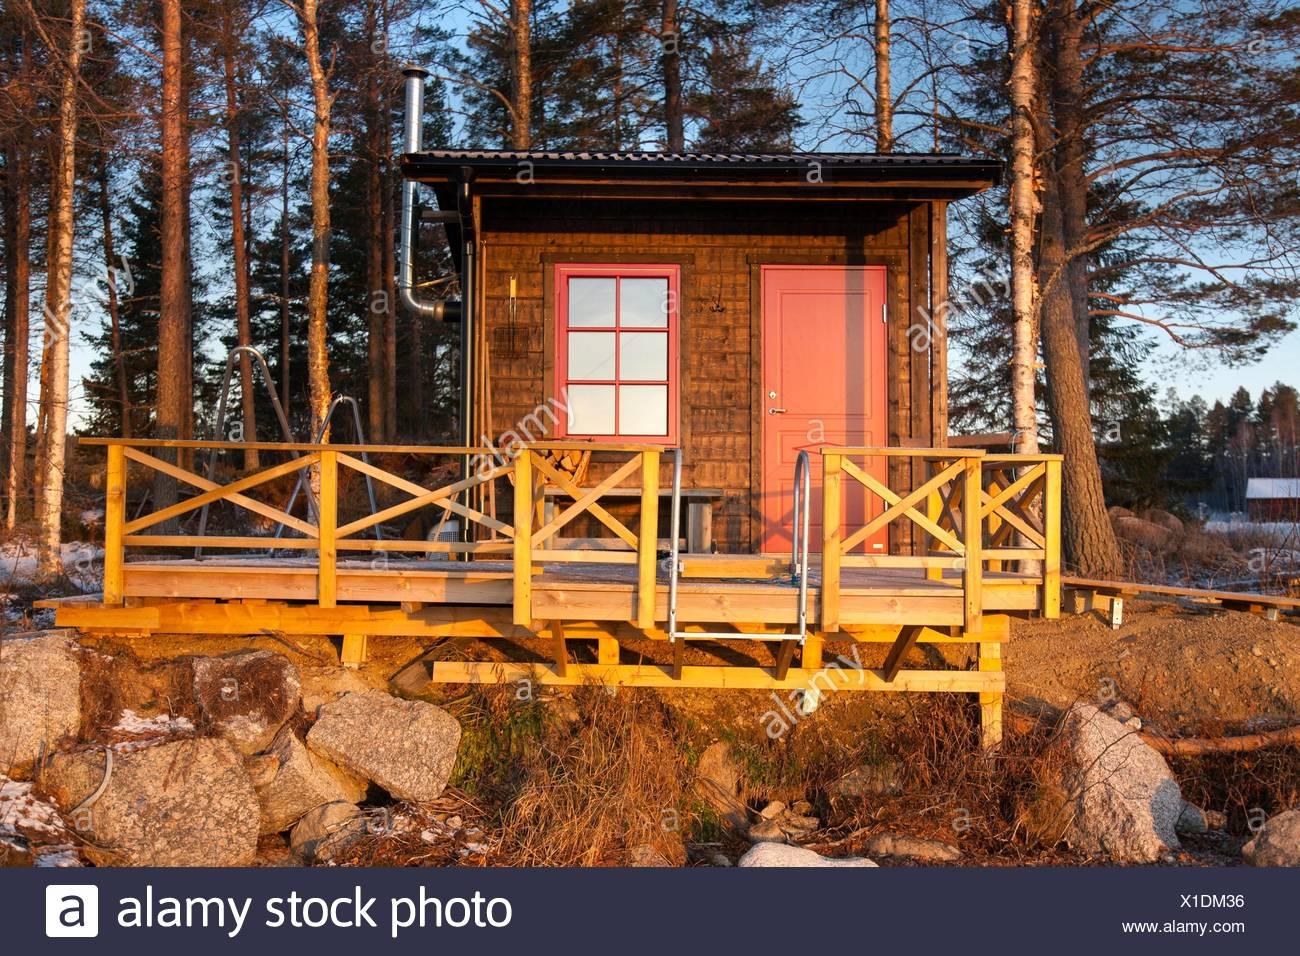 Sauna Northern Sweden. - Stock Image